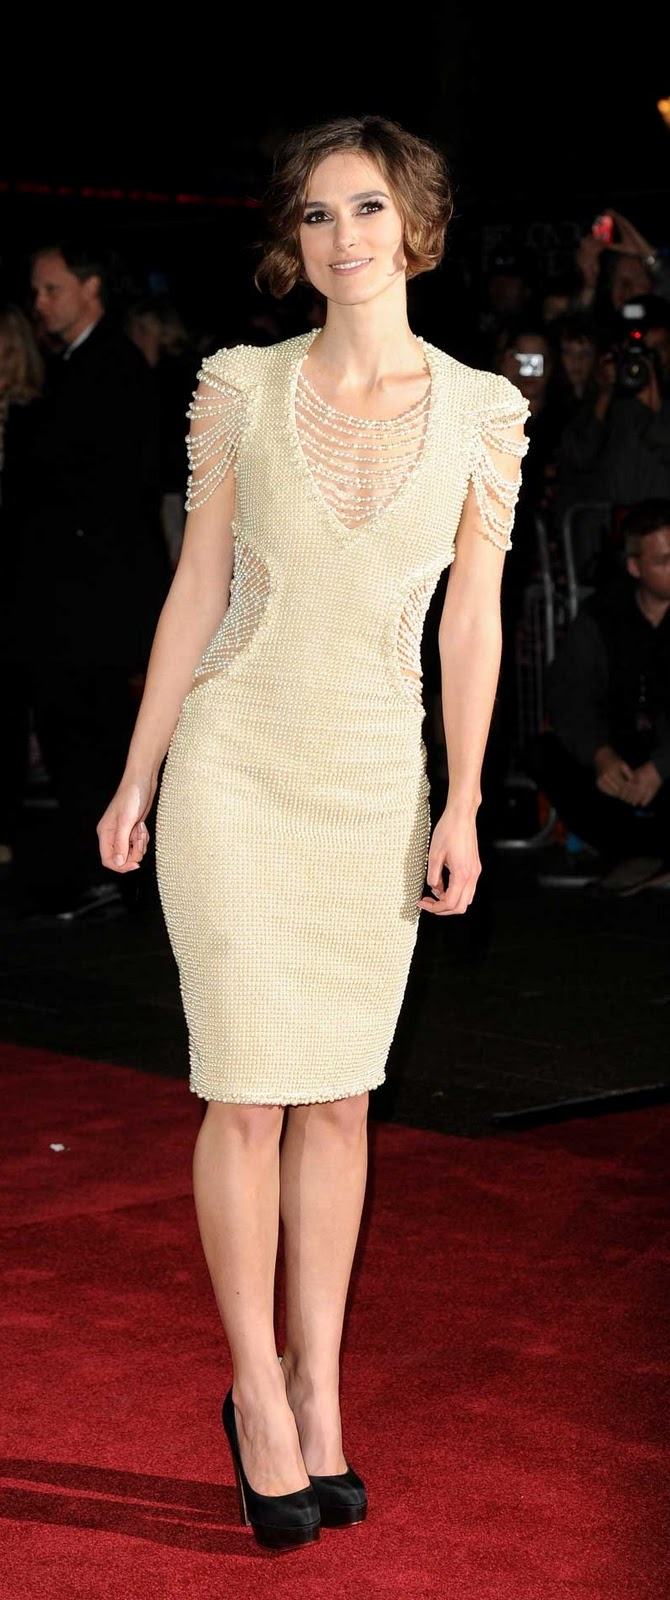 keira knightley classy 7 - Keira Knightley ve Boncuk ��elemeli Elbise Modeli